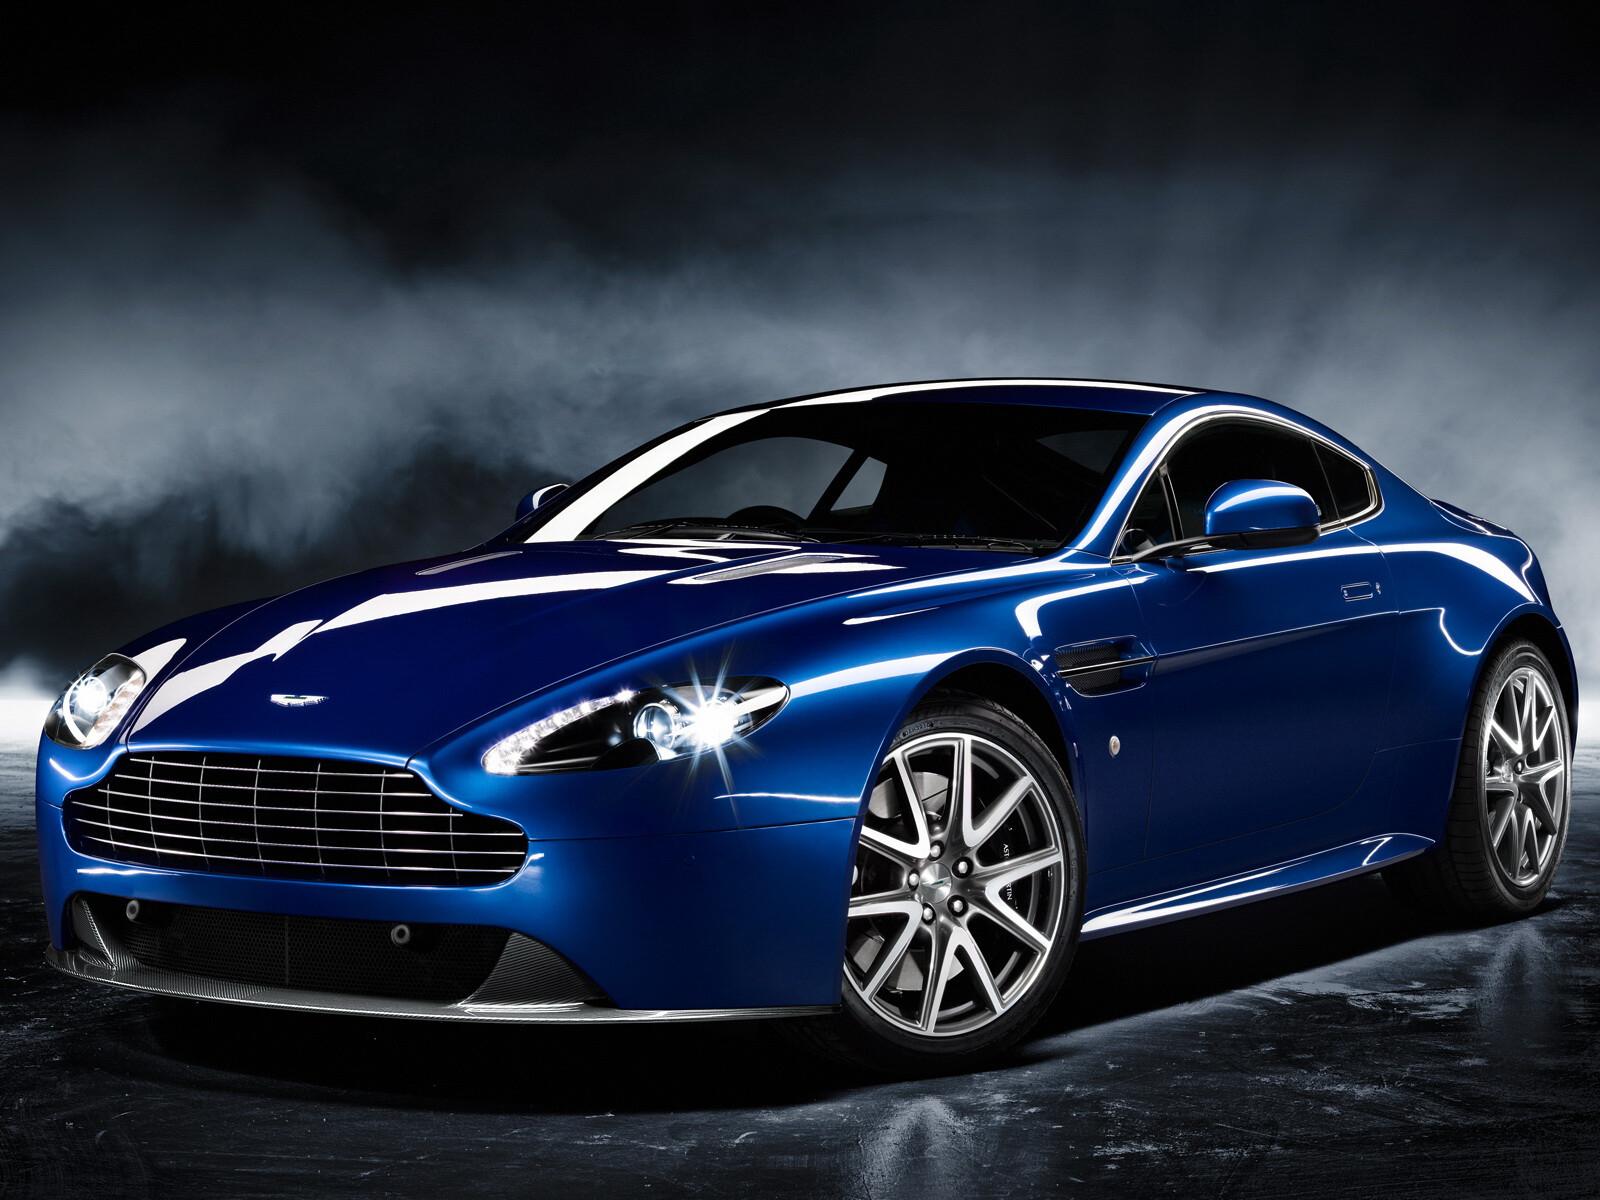 Aston Martin V8 Vantage buyer's guide